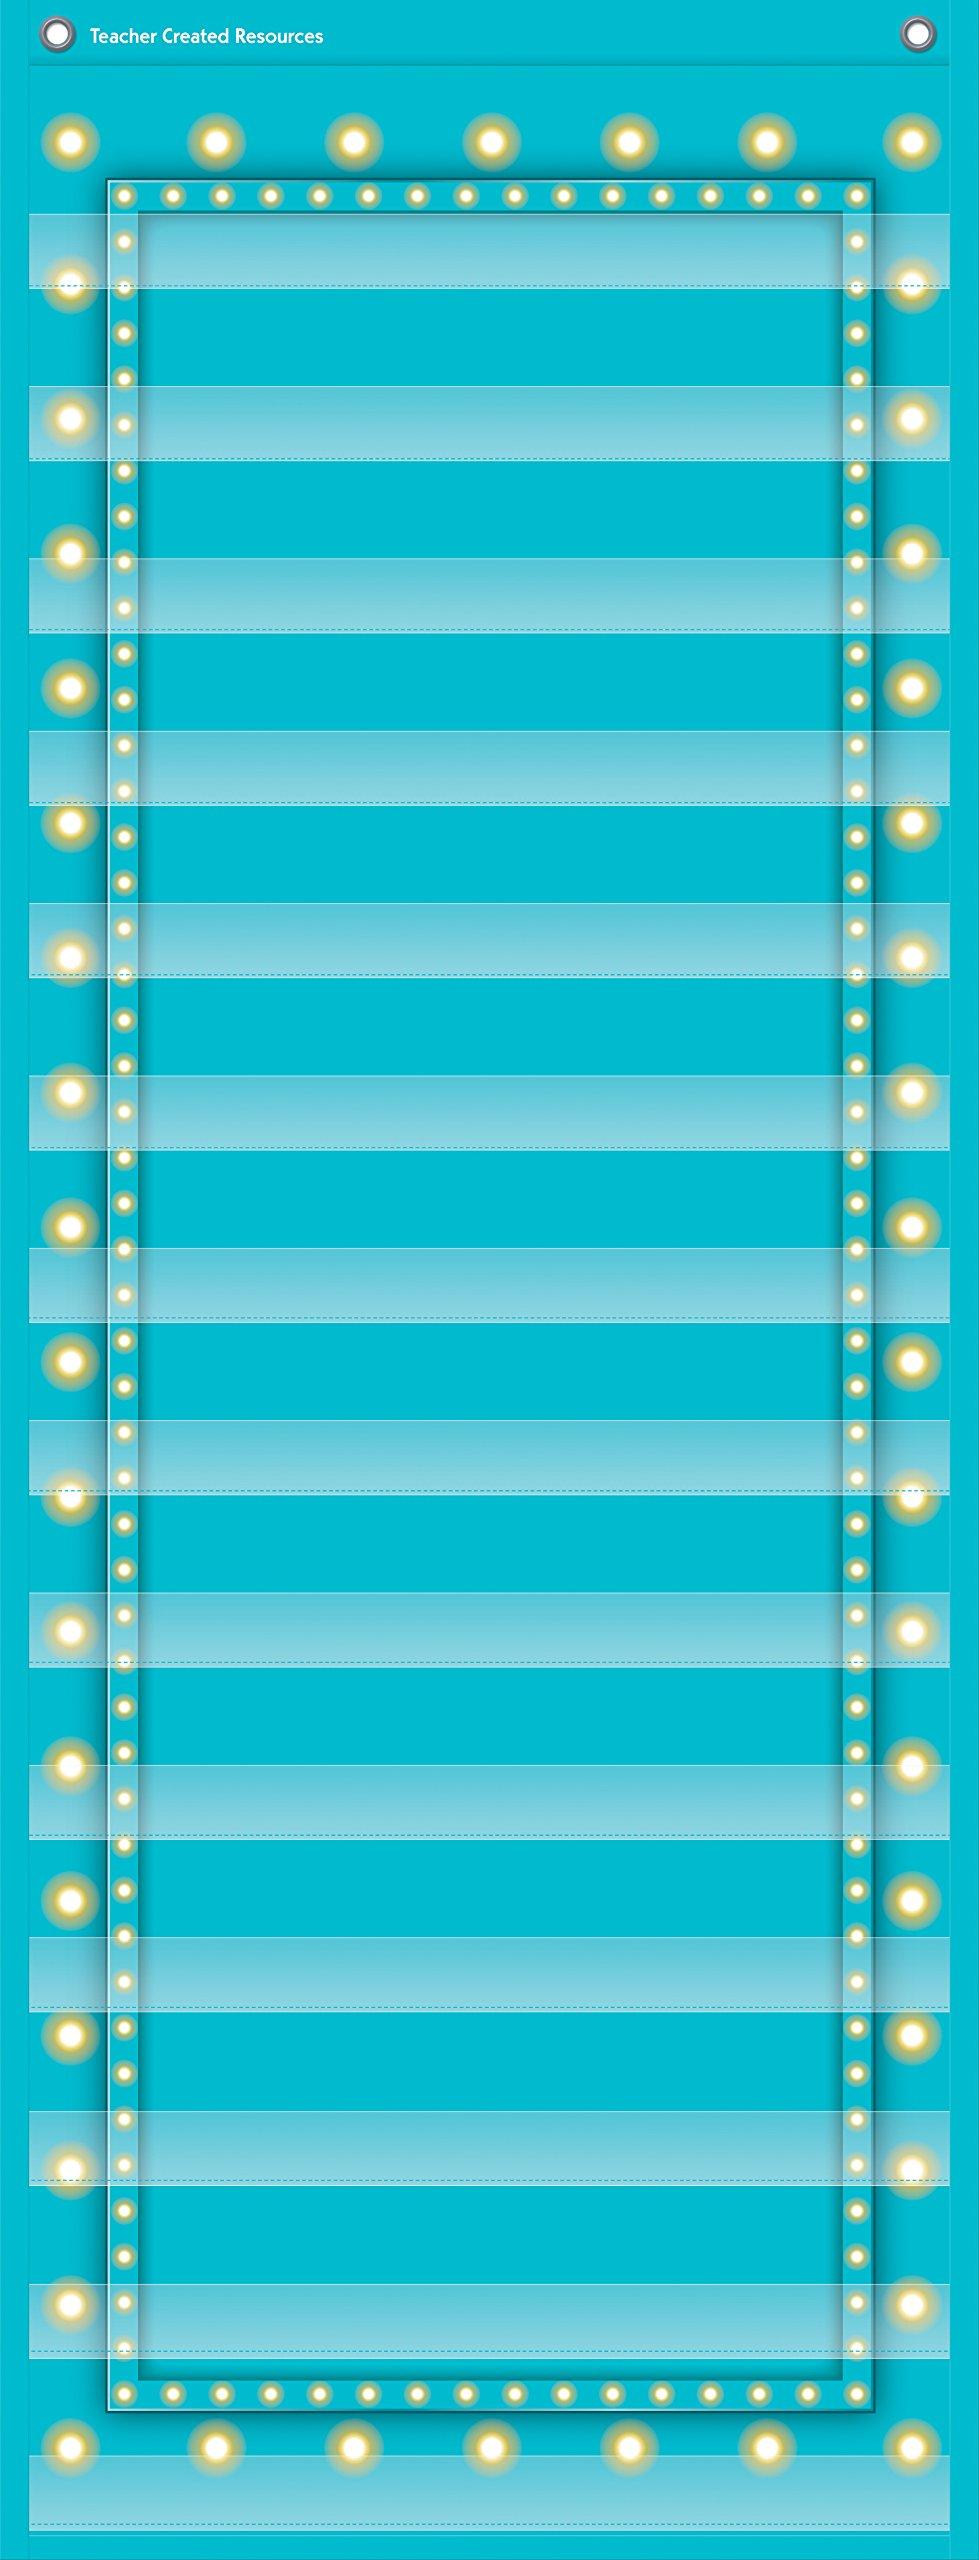 Teacher Created Resources Light Blue Marquee 14 Pocket Chart (13'' x 34'')